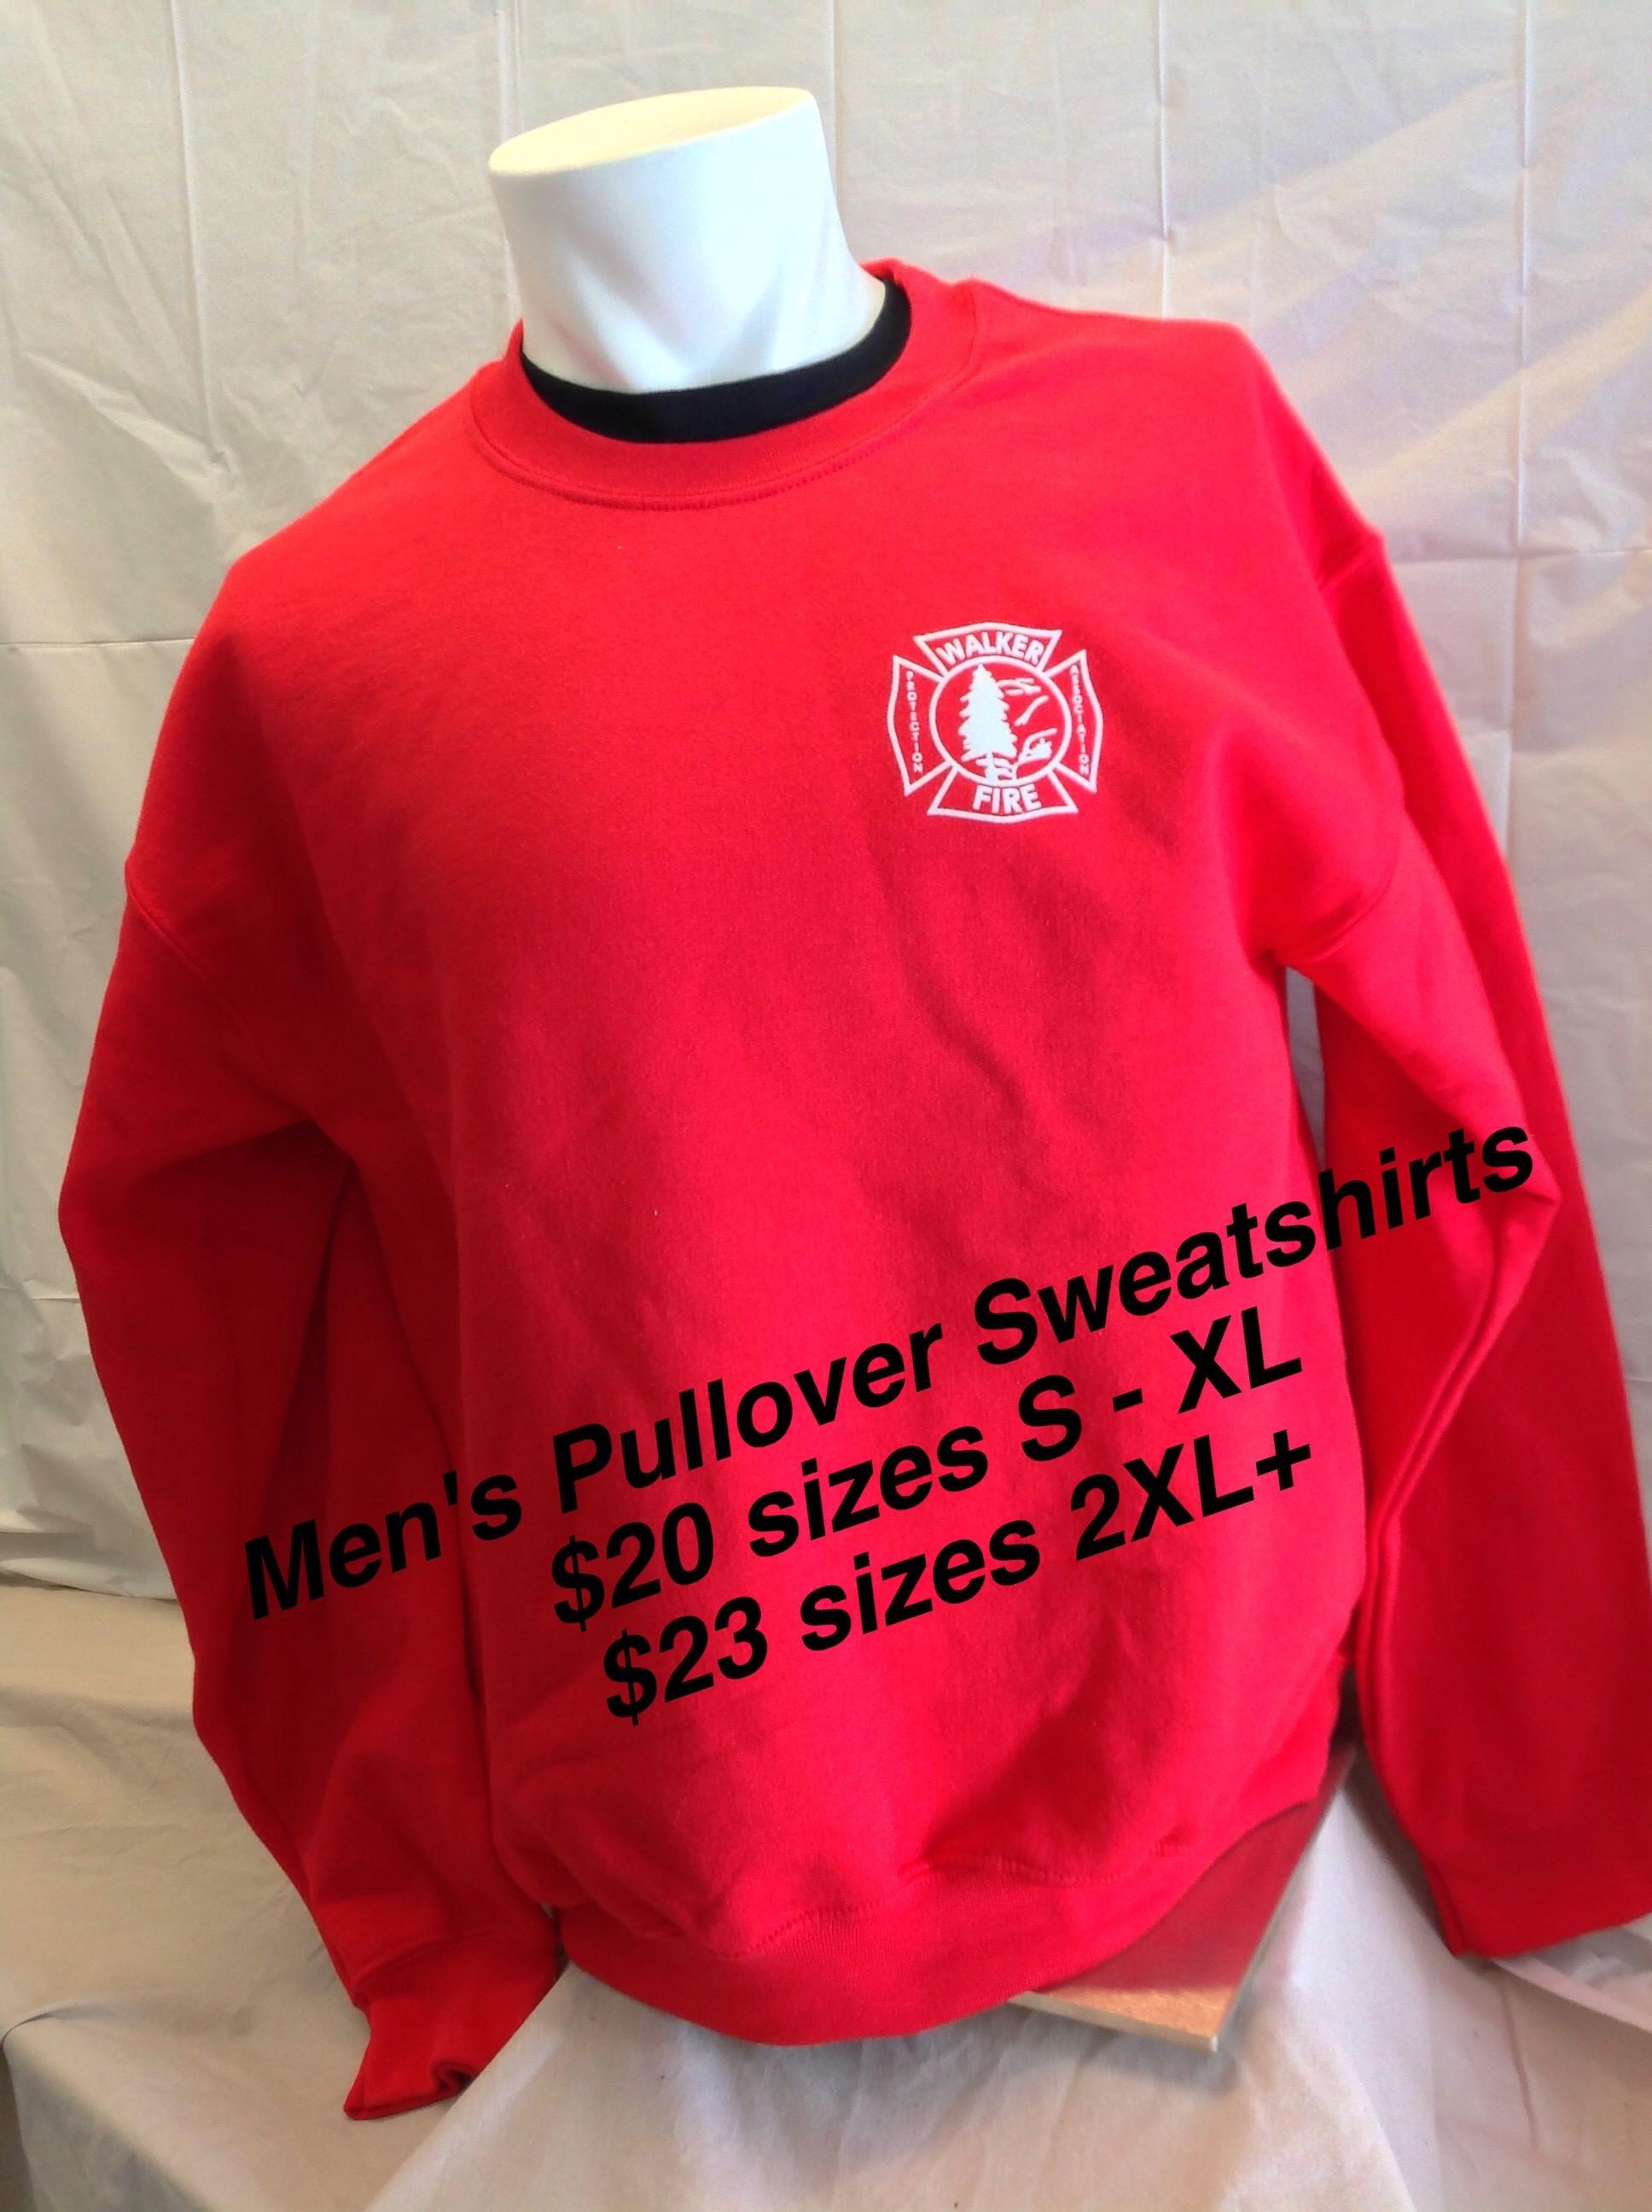 Mens_Pullover_Sweatshirts